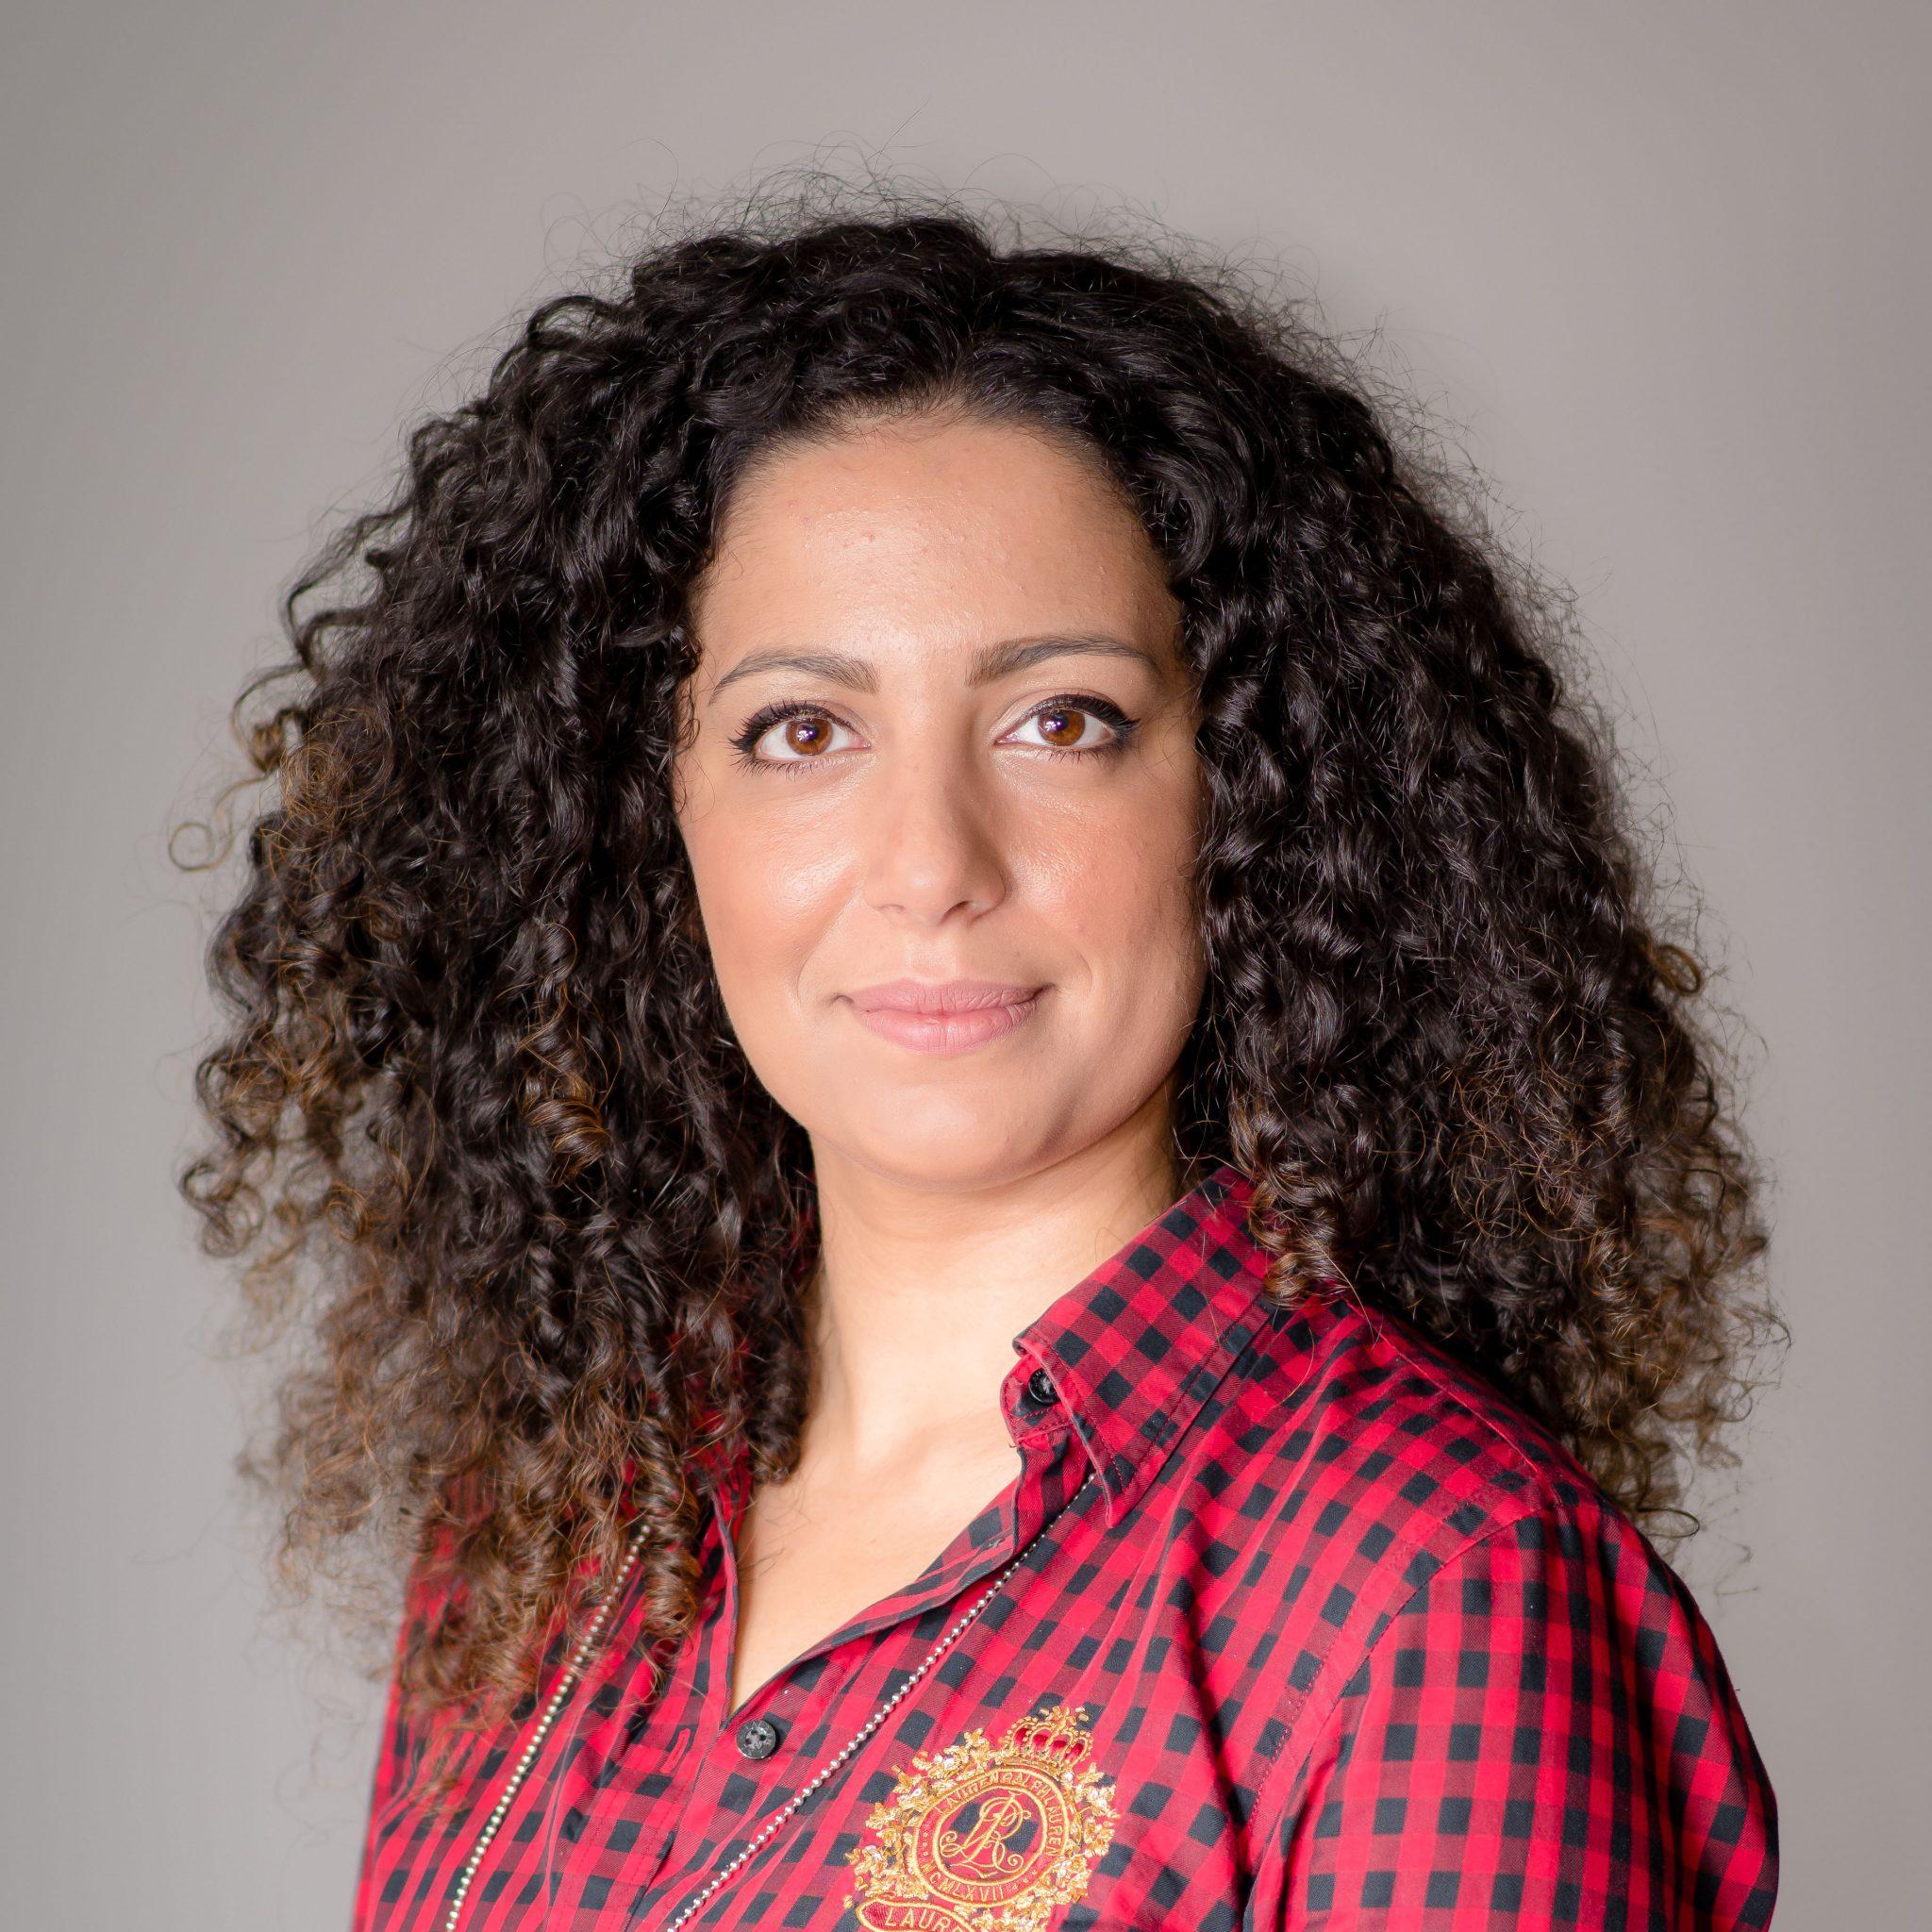 Gabriella Dima